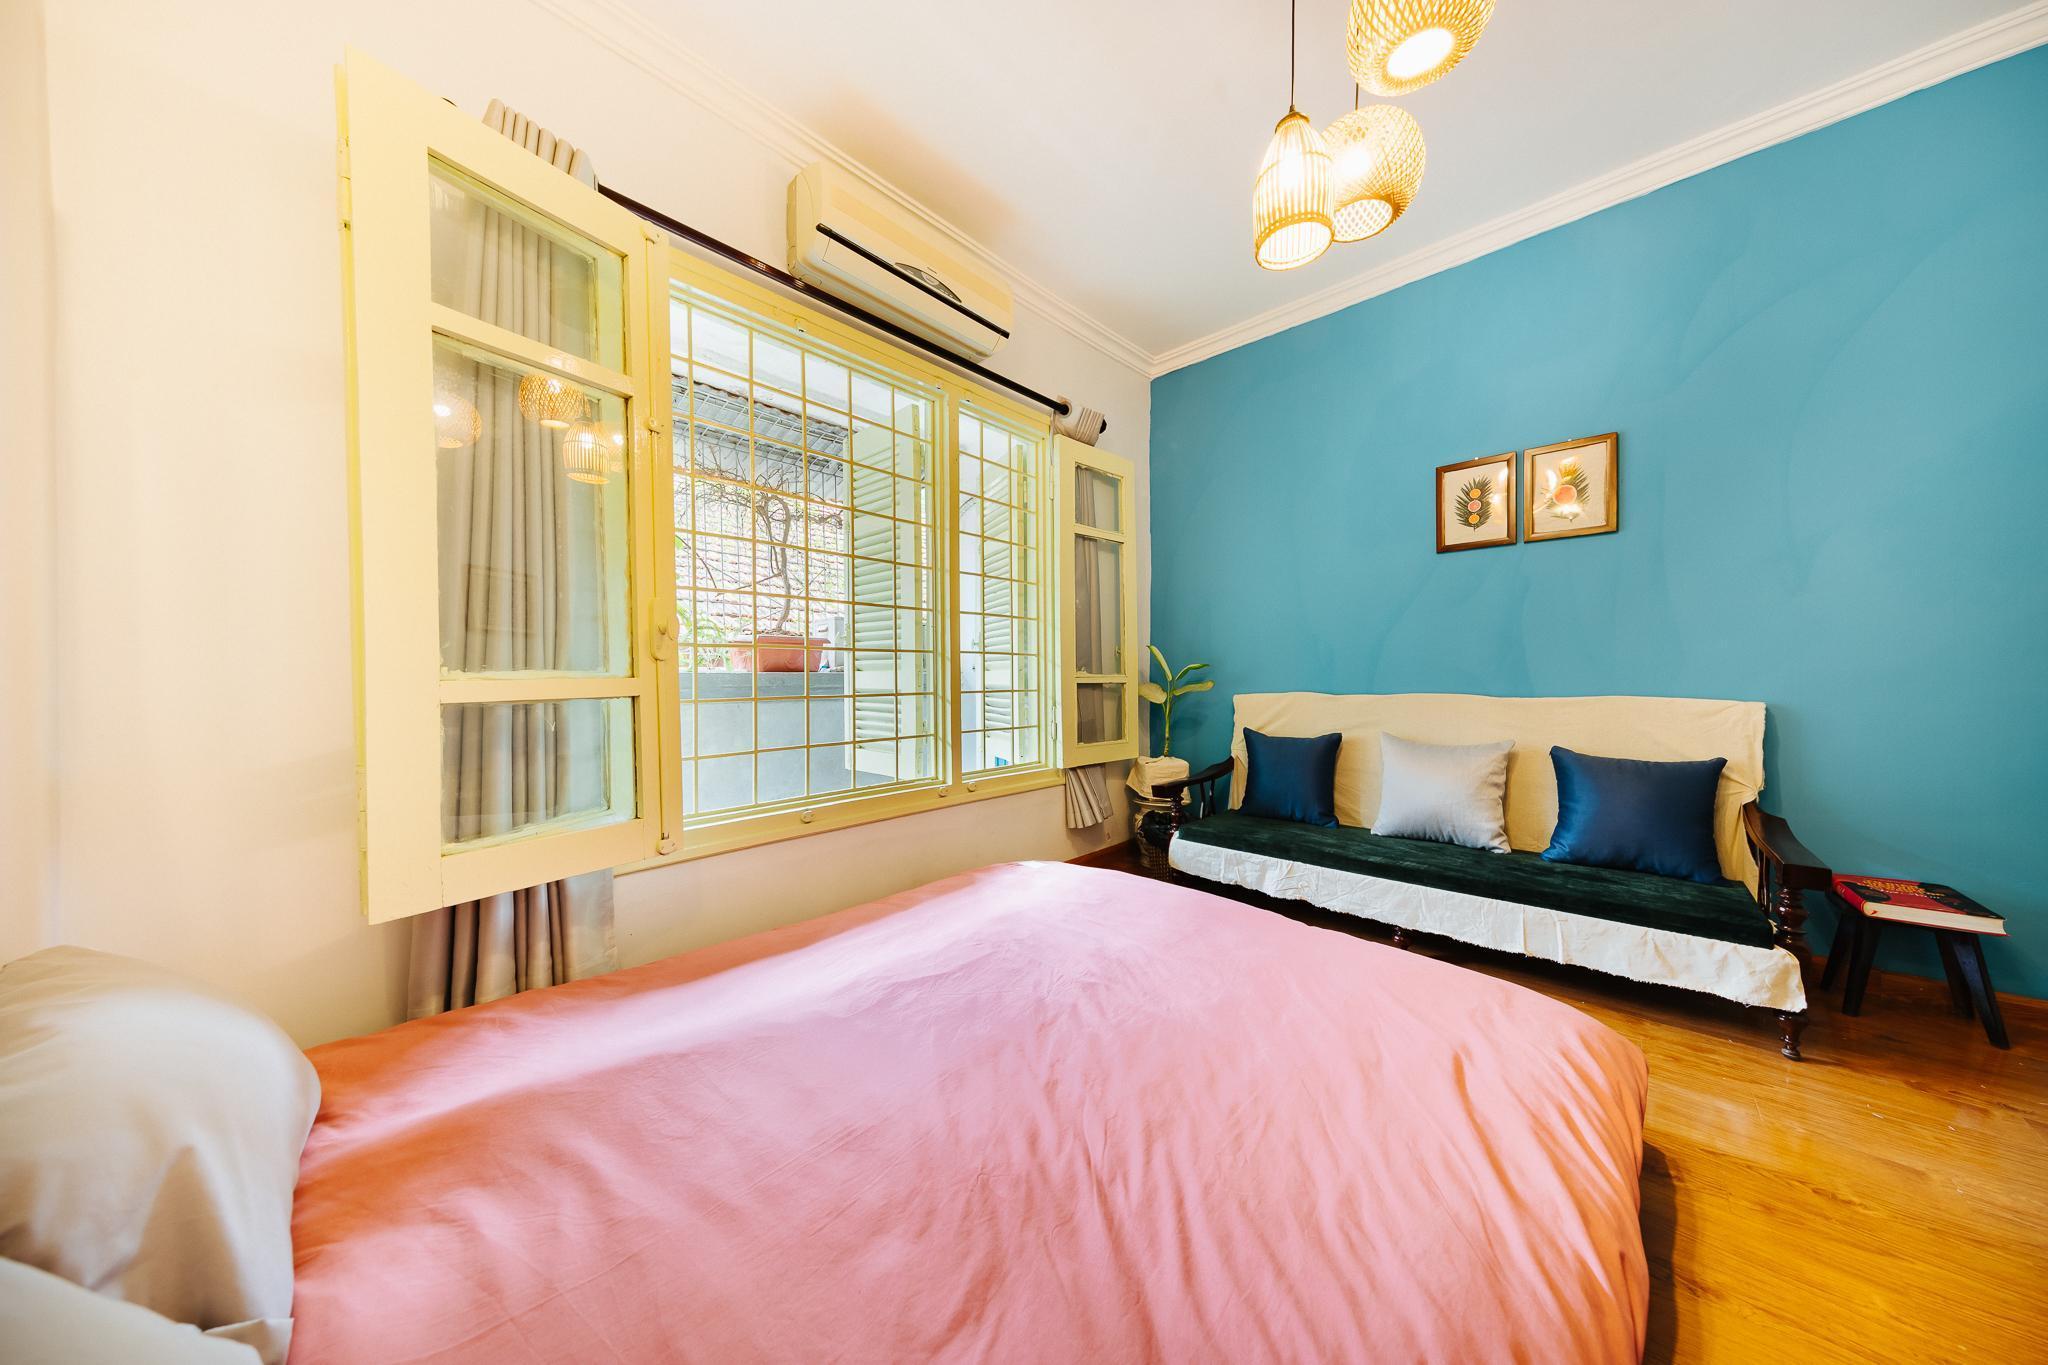 Windy House   A Cozy Nostalgic Flat In Hoan Kiem